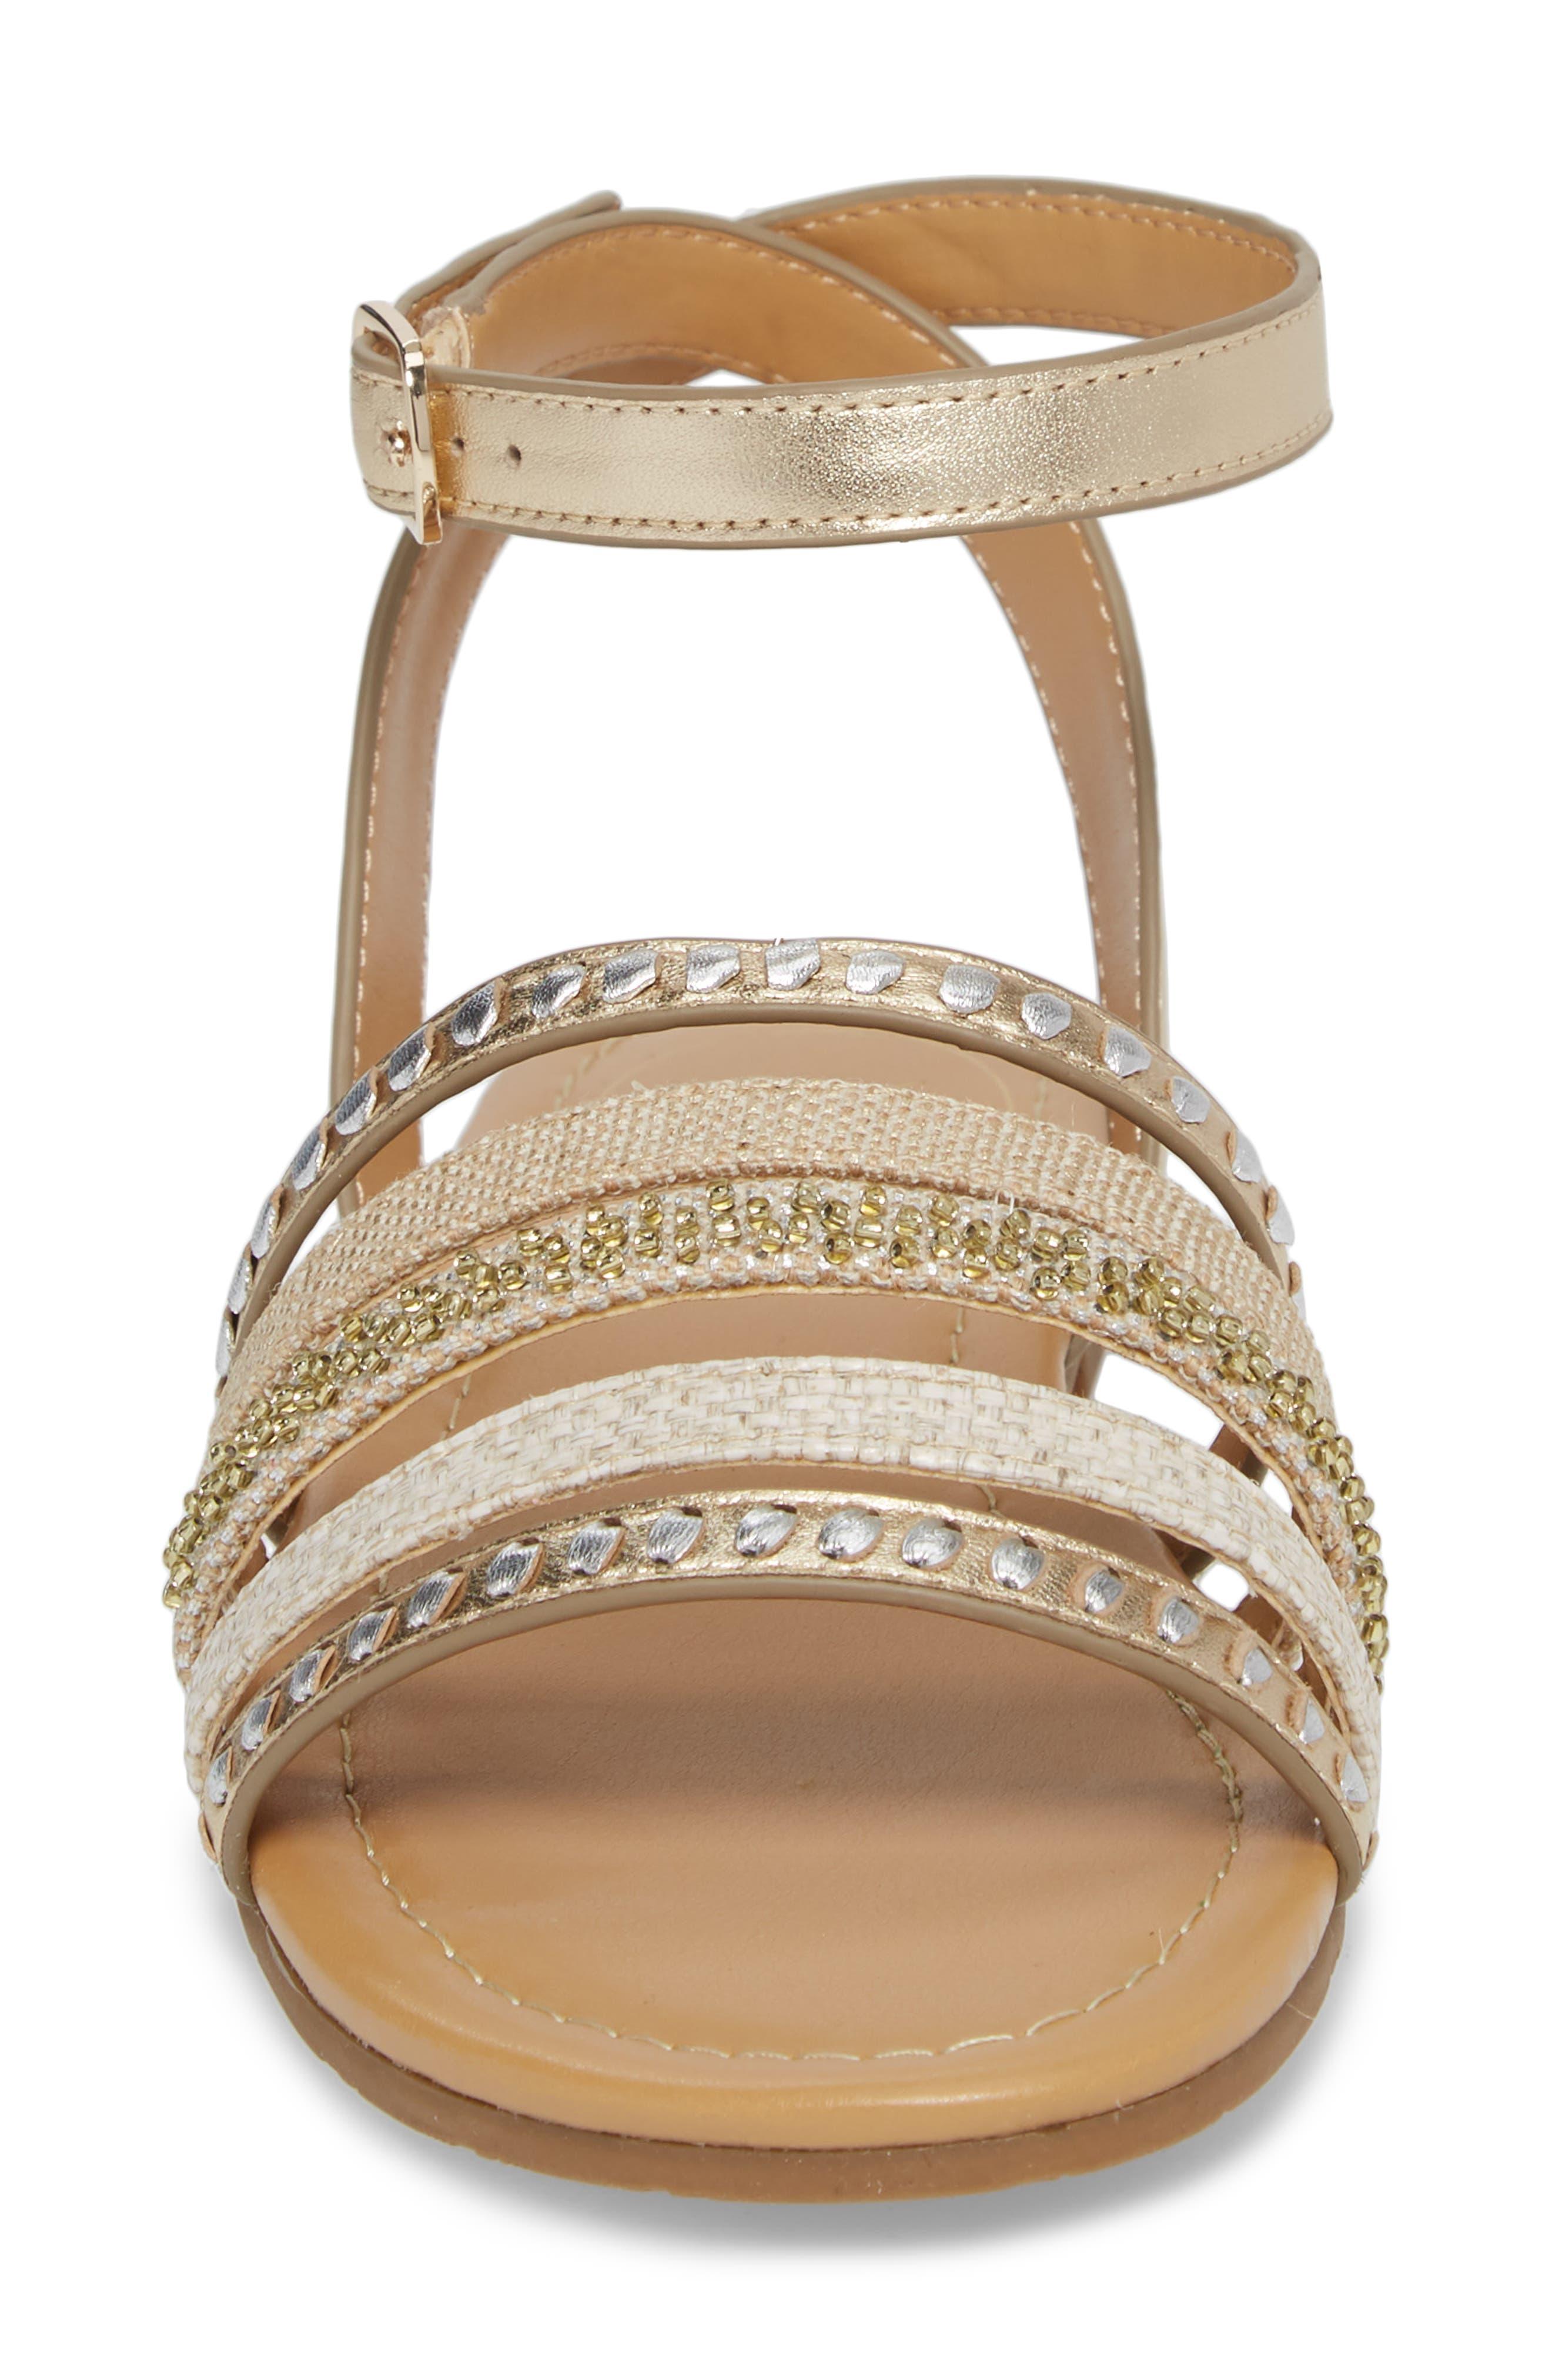 Hannah Braided Embellished Sandal,                             Alternate thumbnail 4, color,                             Platinum/ Silver Leather